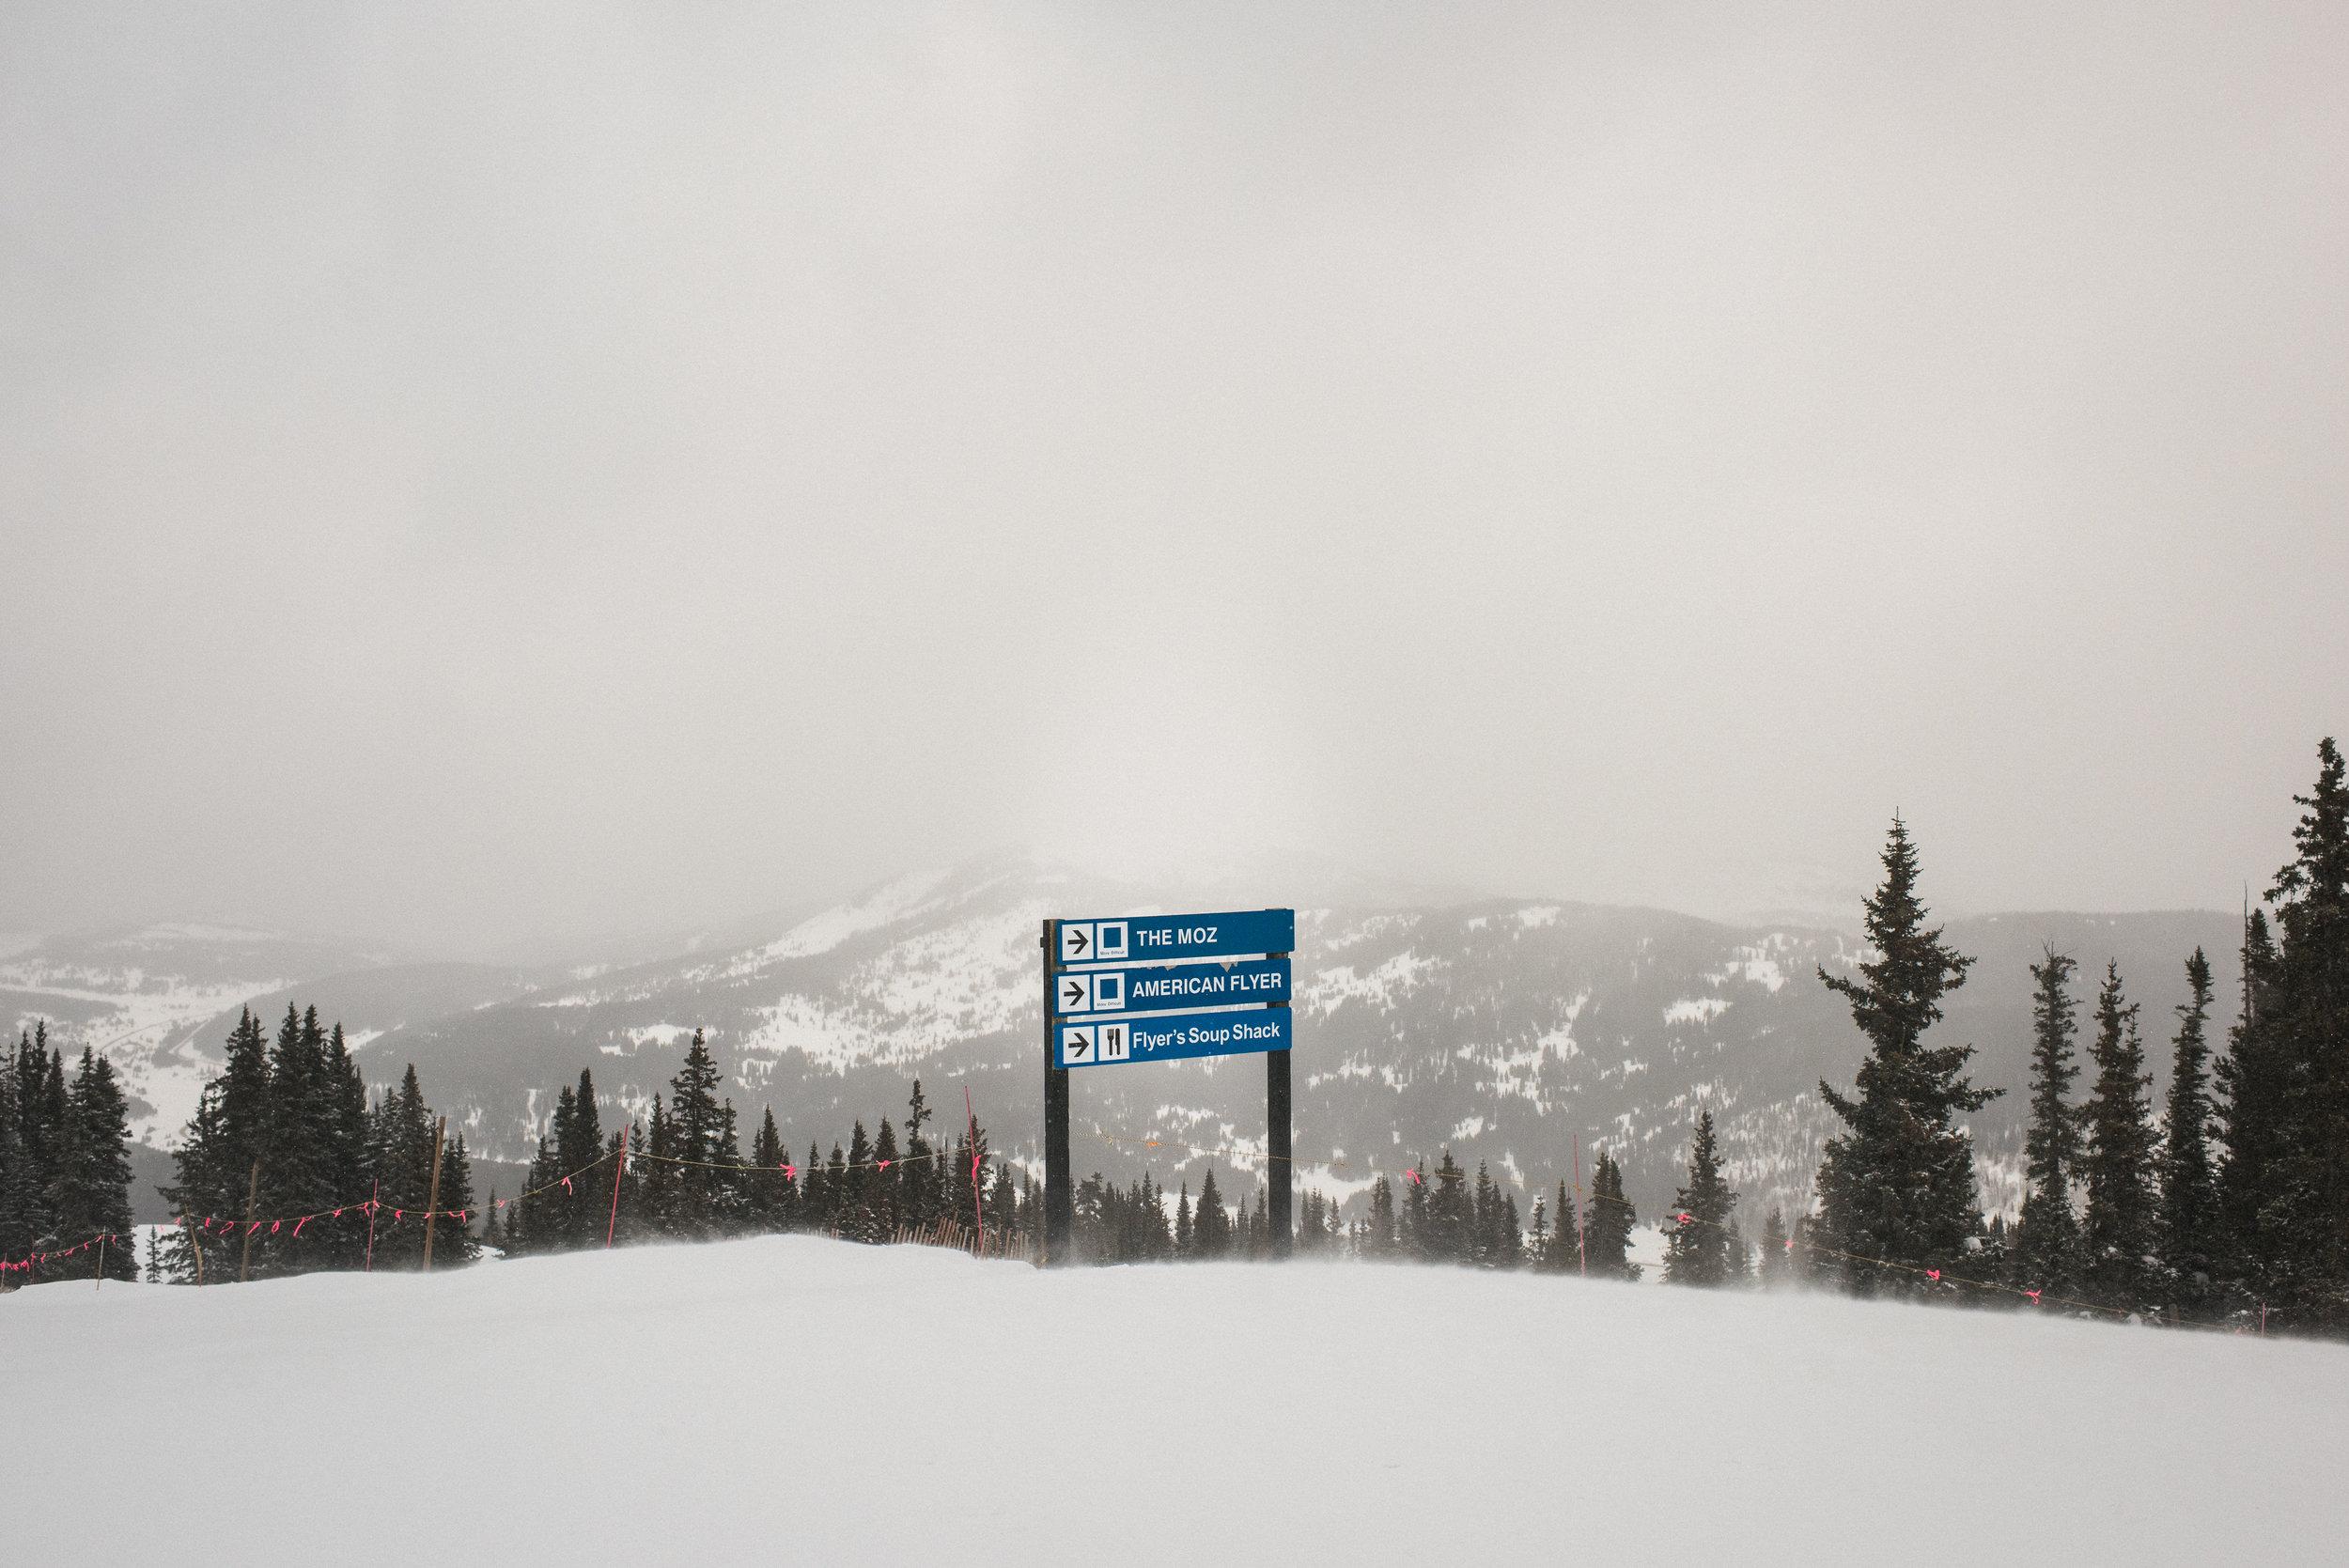 TaraShupe_Outdoor_Photographer_Loweprobags_Colorado_Copper_Mountains_Ski_19.jpg